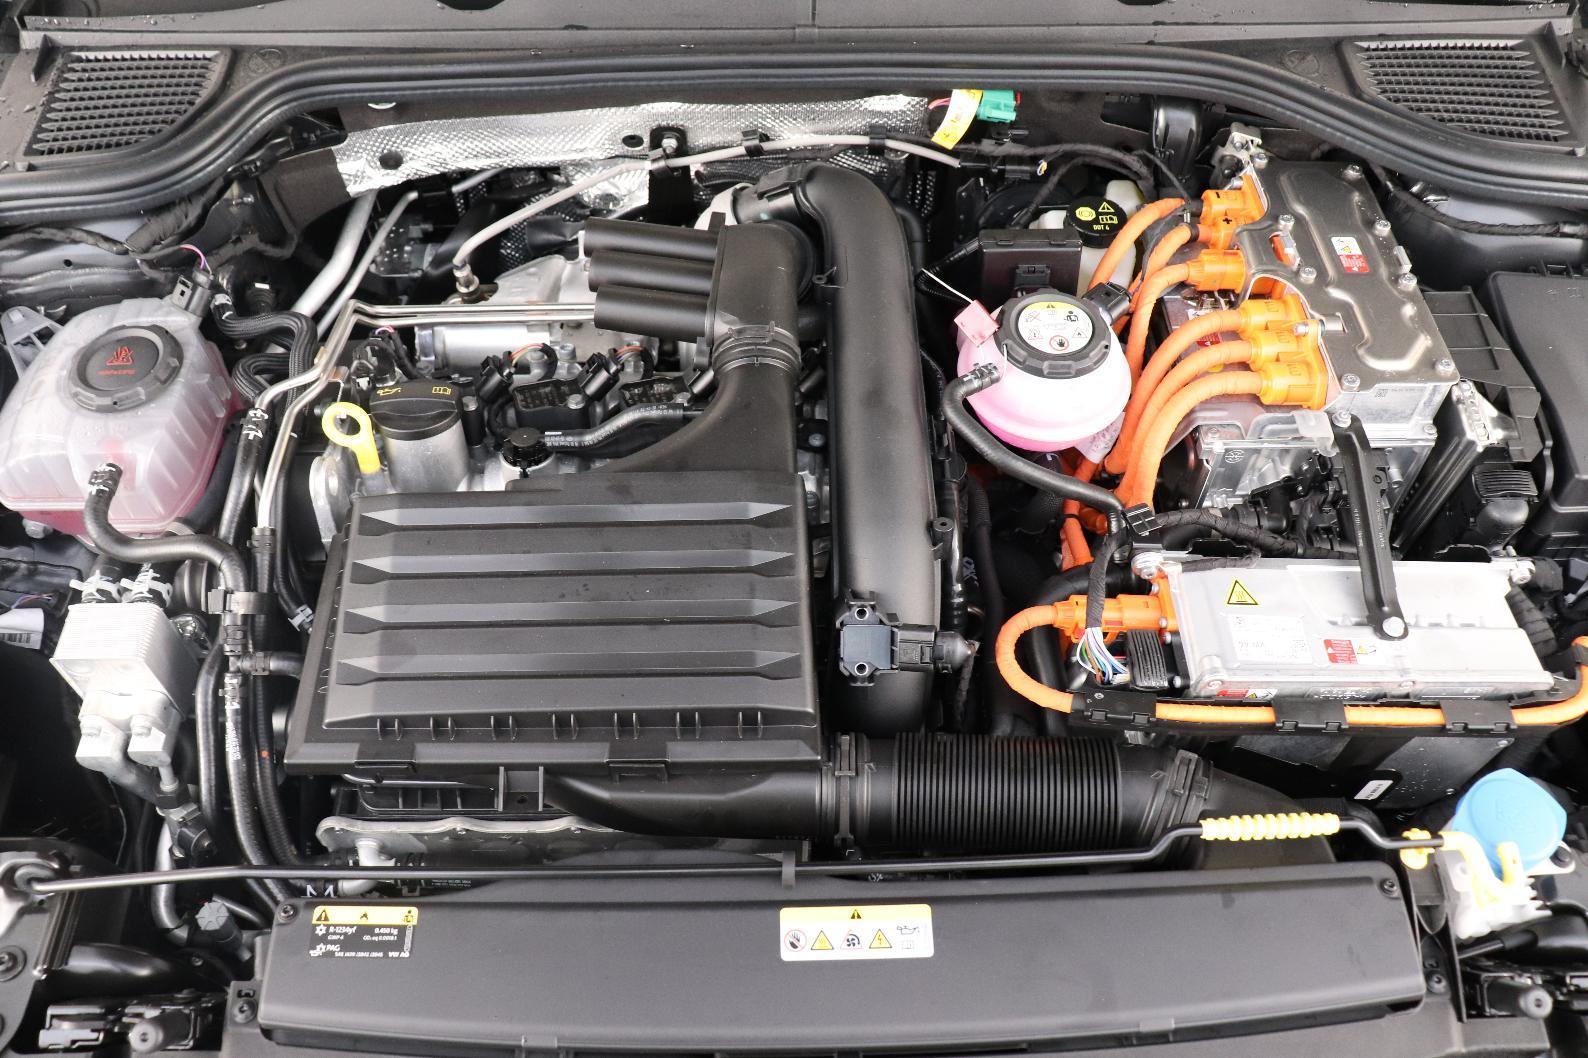 VOLKSWAGEN GOLF 1.4 Hybrid Rechargeable OPF 204 DSG6 Style 1st